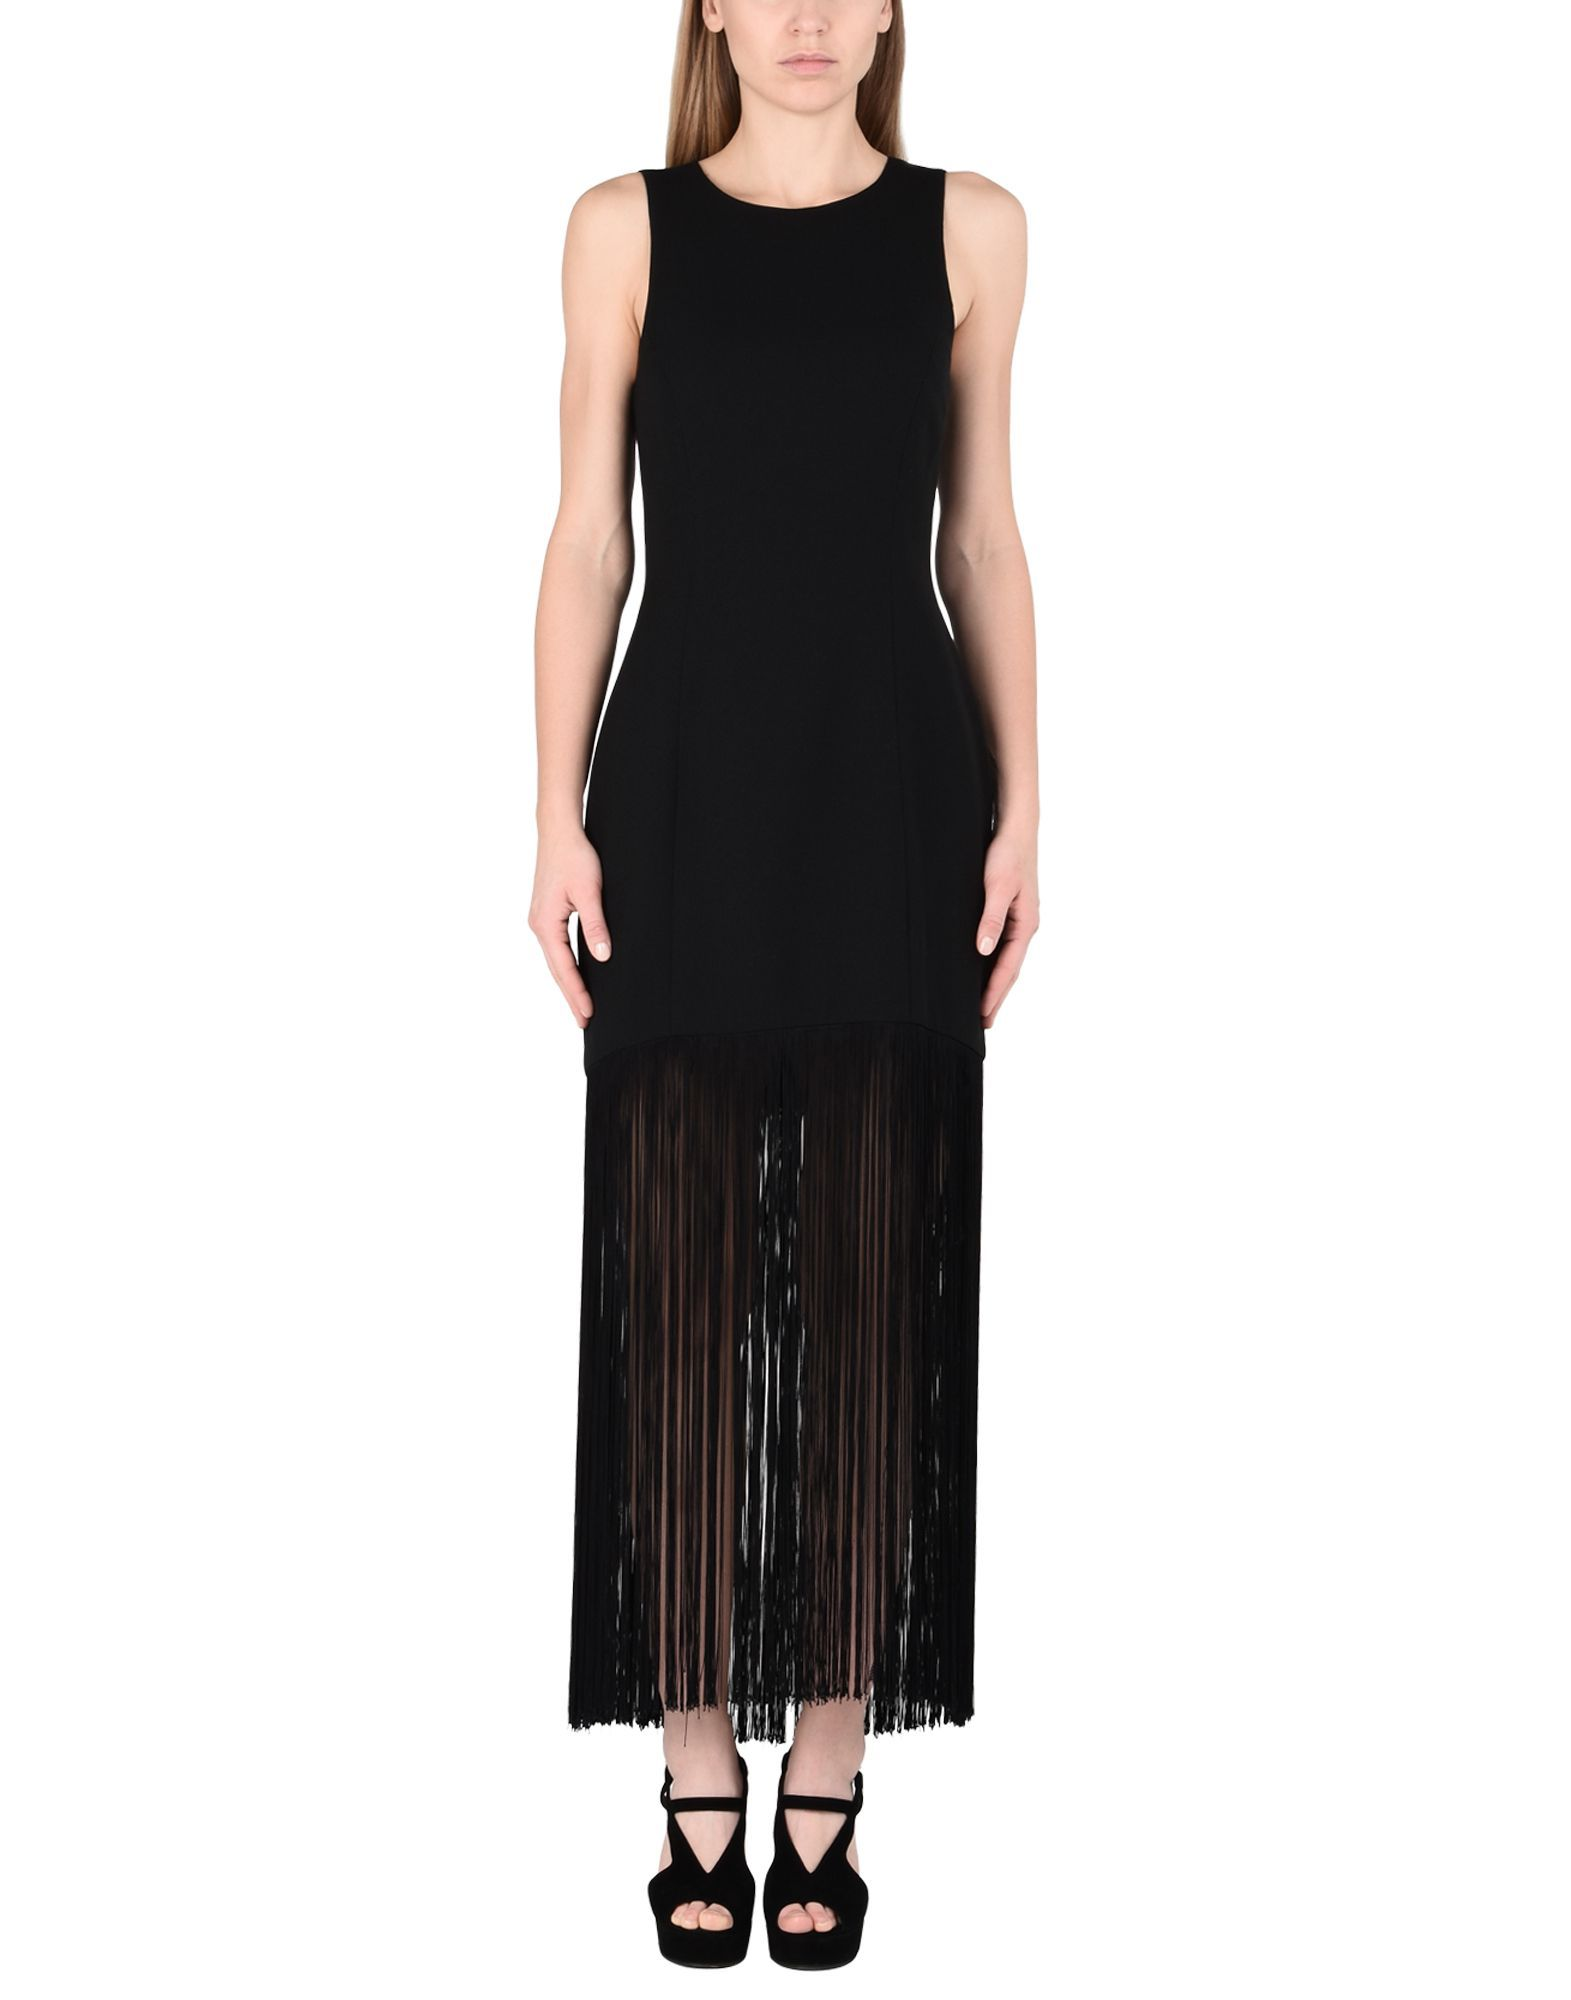 Prabal Gurung Black Sleeveless Dress